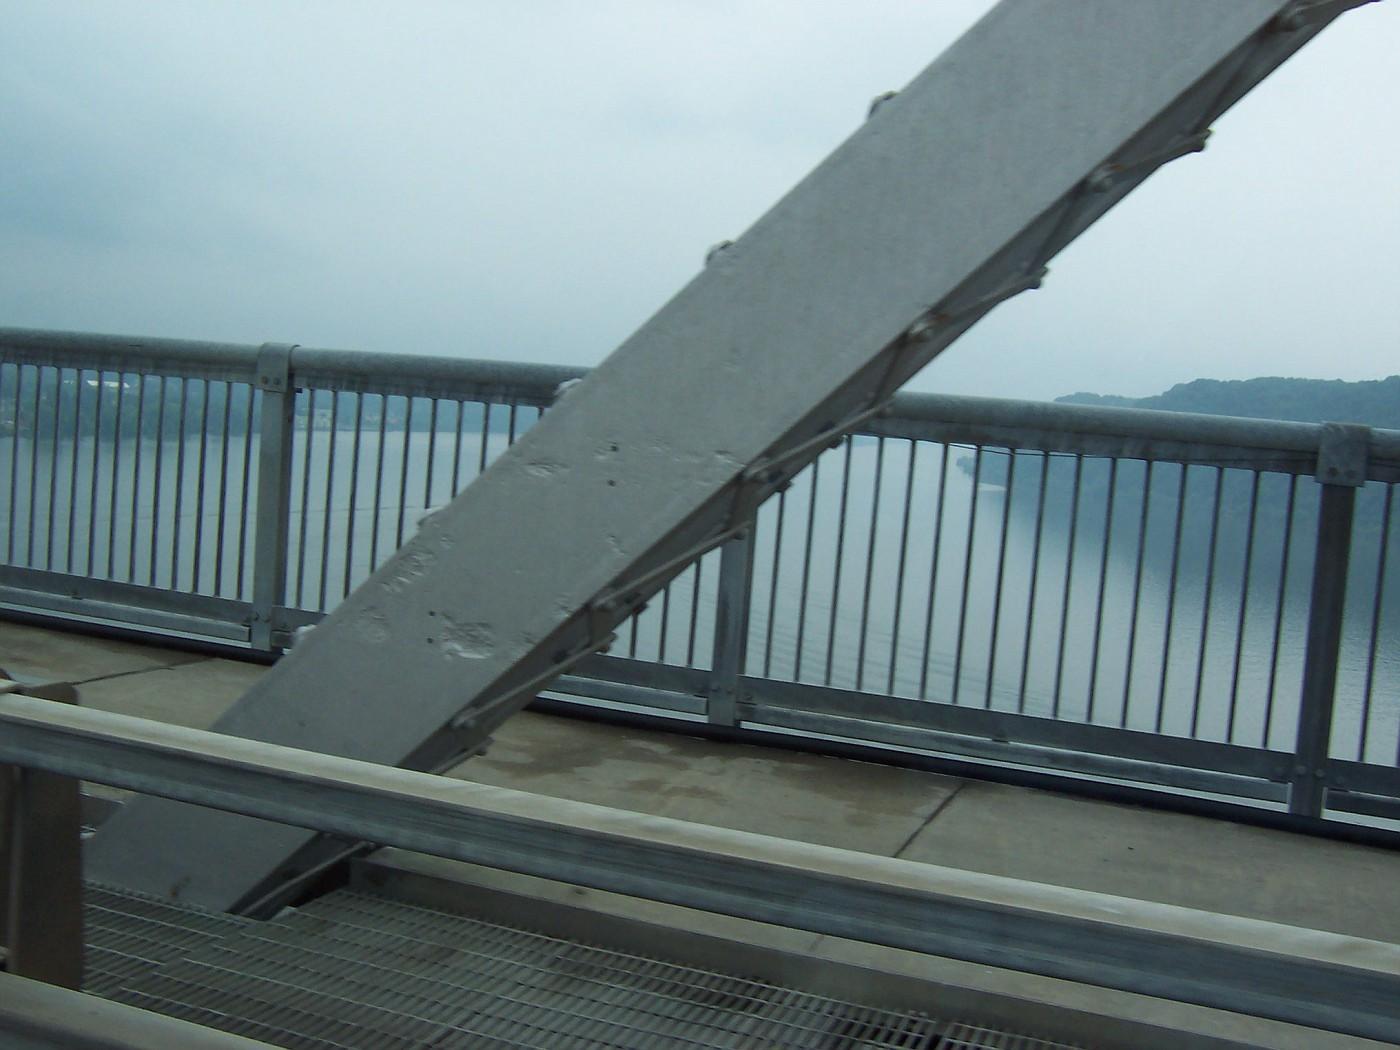 Looking off the Mid-Hudson Bridge